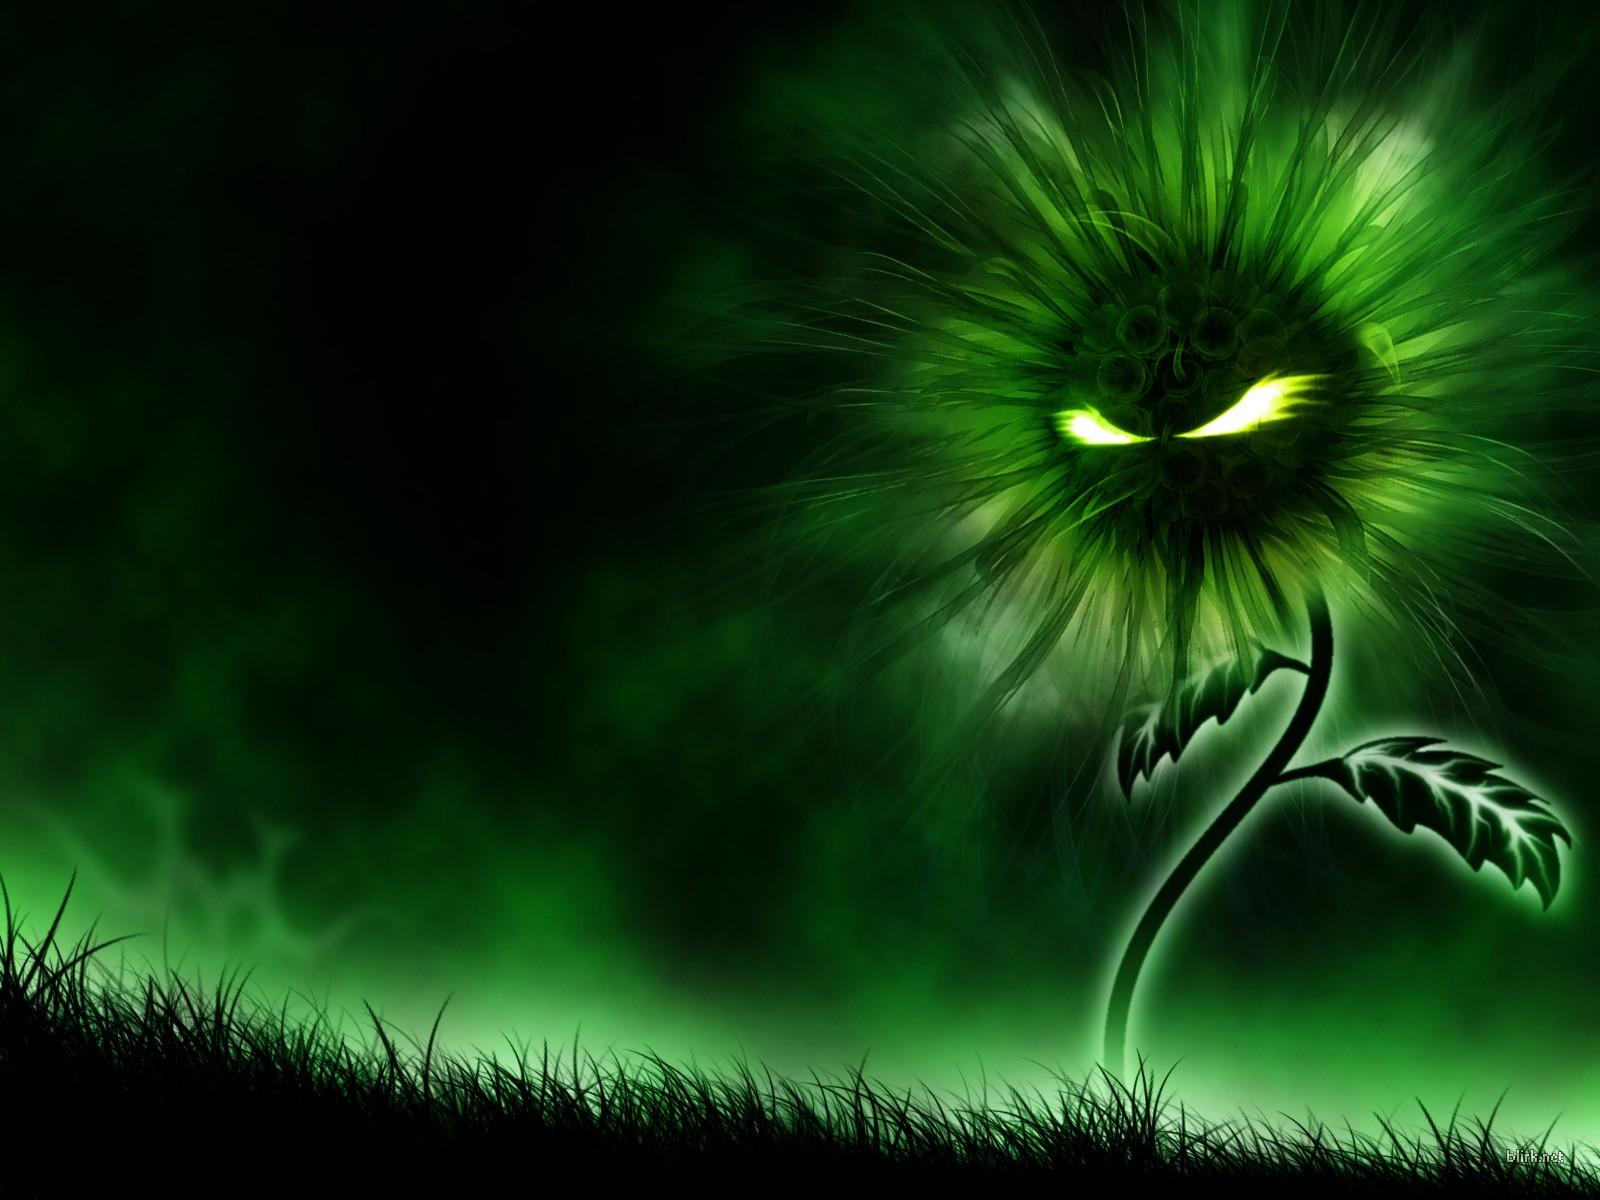 green cool wallpaper hd